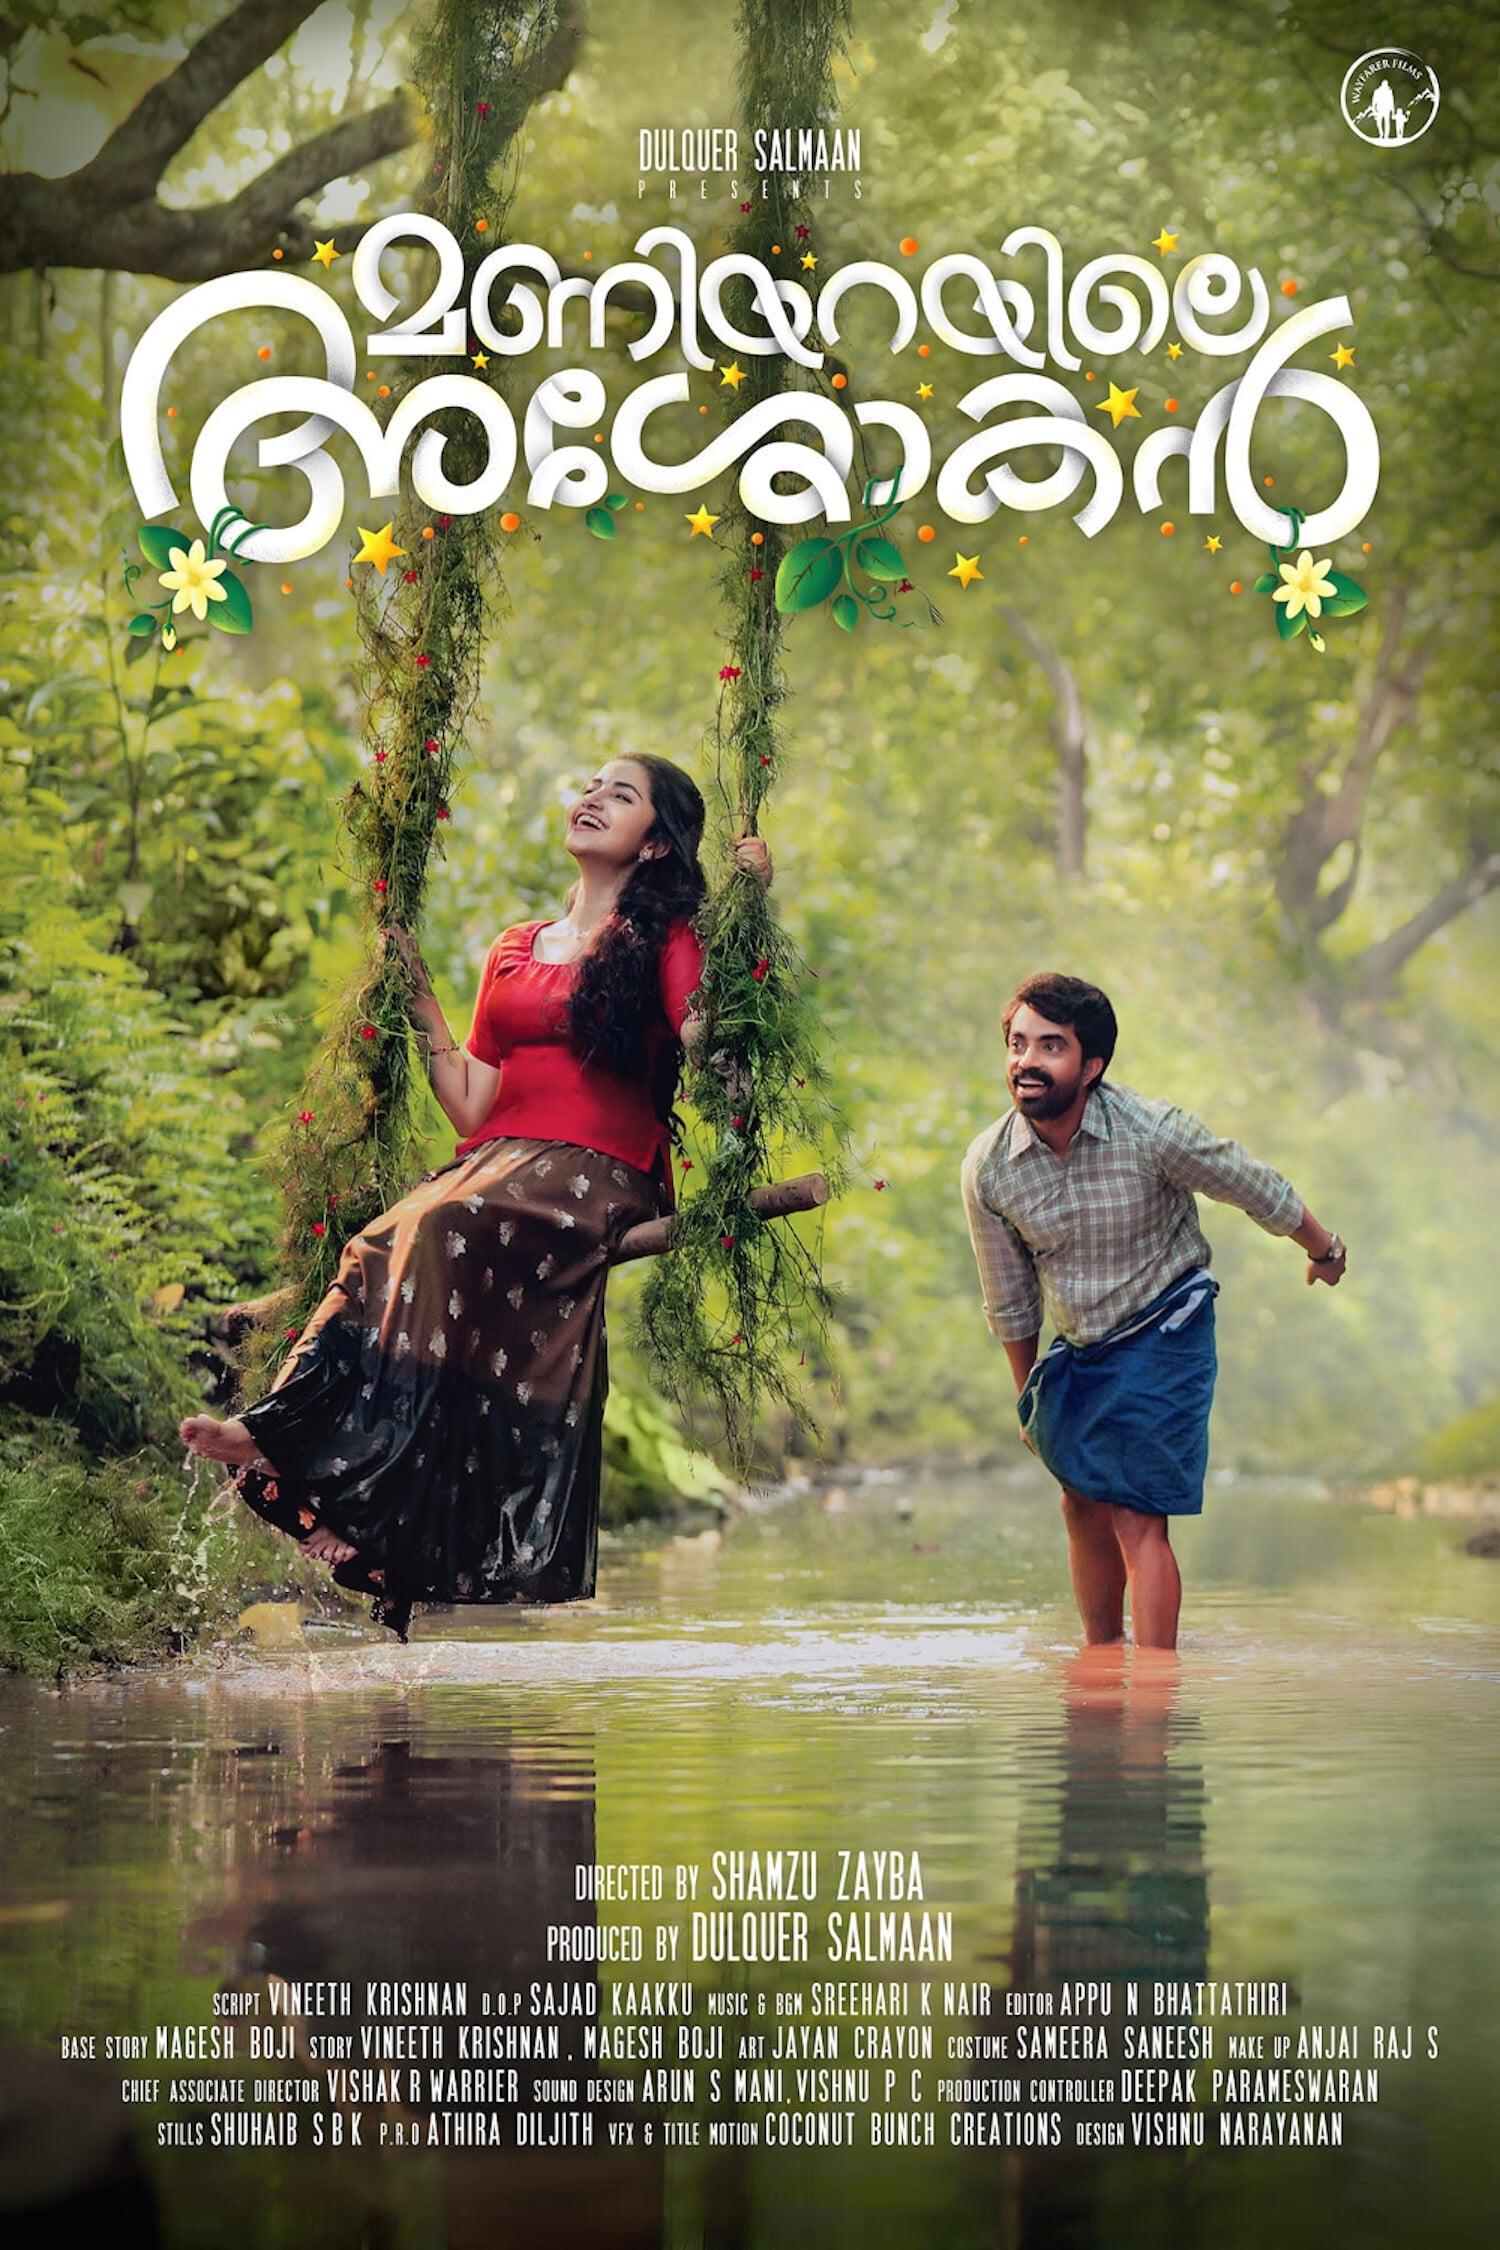 Maniyarayile Ashokan 2020 Malayalam 1080p WEB-DL DDP5.1 x264 [5.2 GB] 720p WEB-Rip [1.24 GB] 480p WEB-Rip [547 MB] | G-Drive